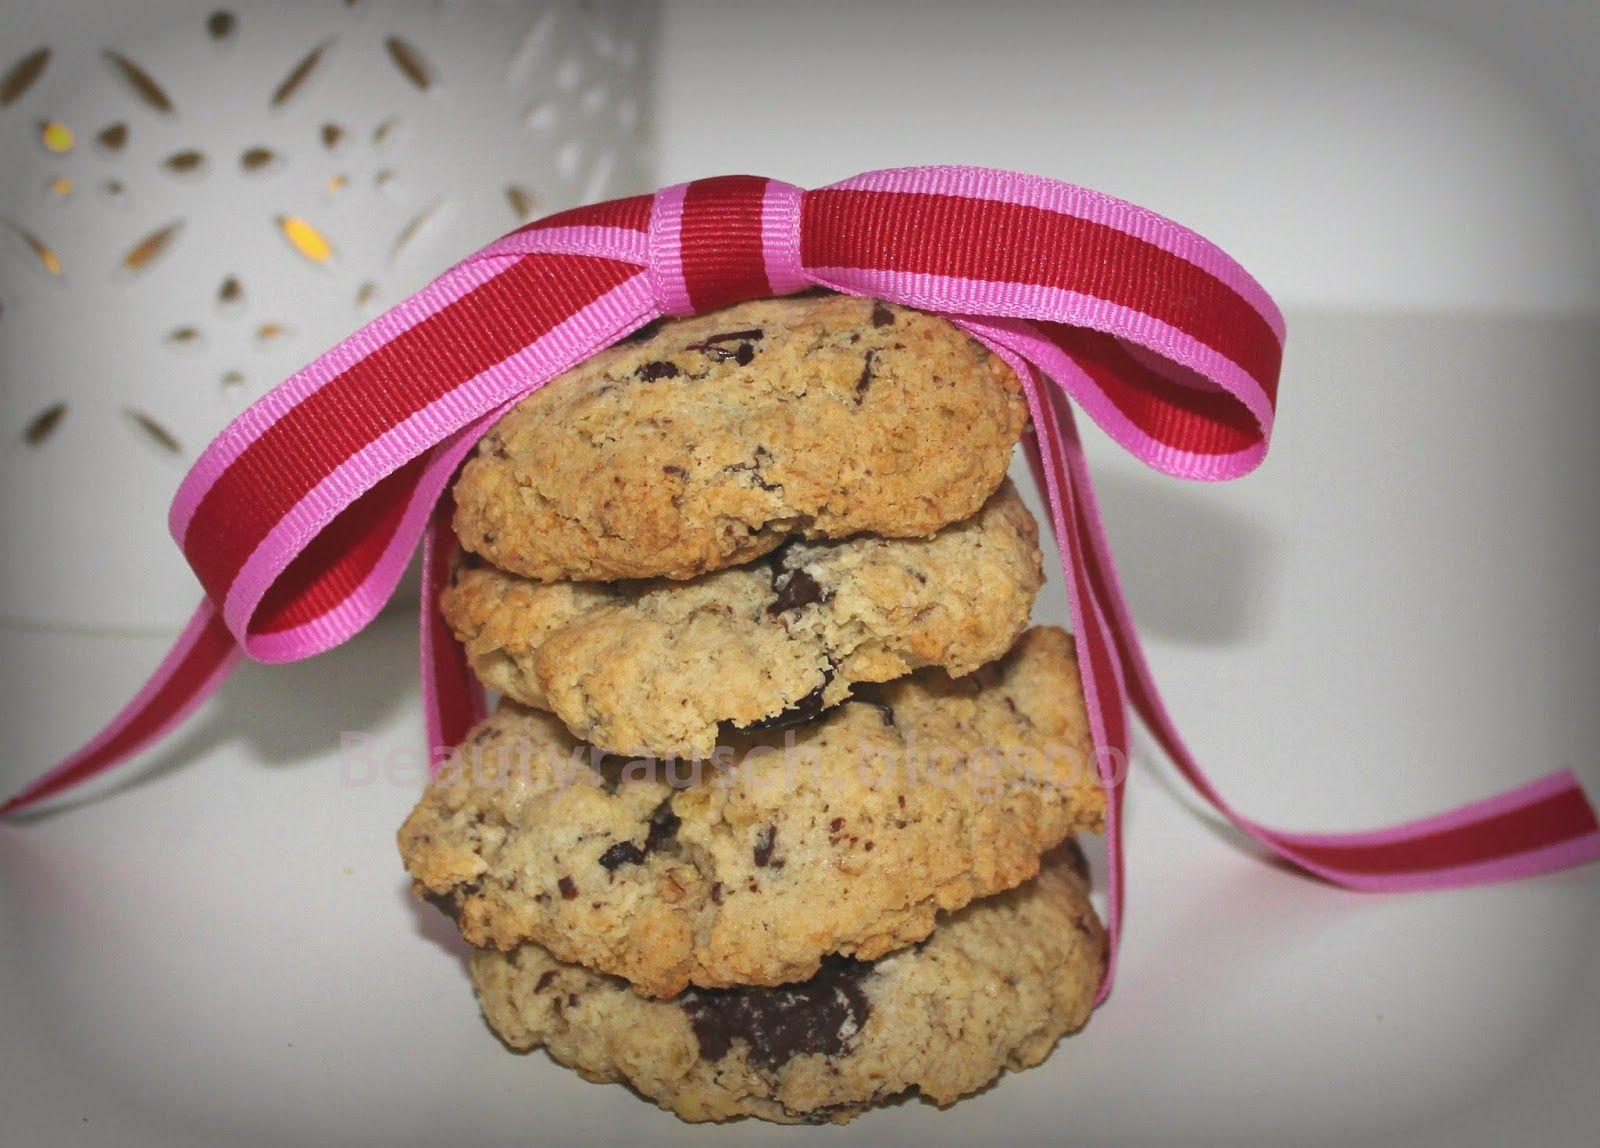 Cookies mit Haferflocken, Meersalz, Schokolade, Kokos und Cranberry  Cookies with Oatmeal, Chocolate, Sea salt, Coco & Cranberries